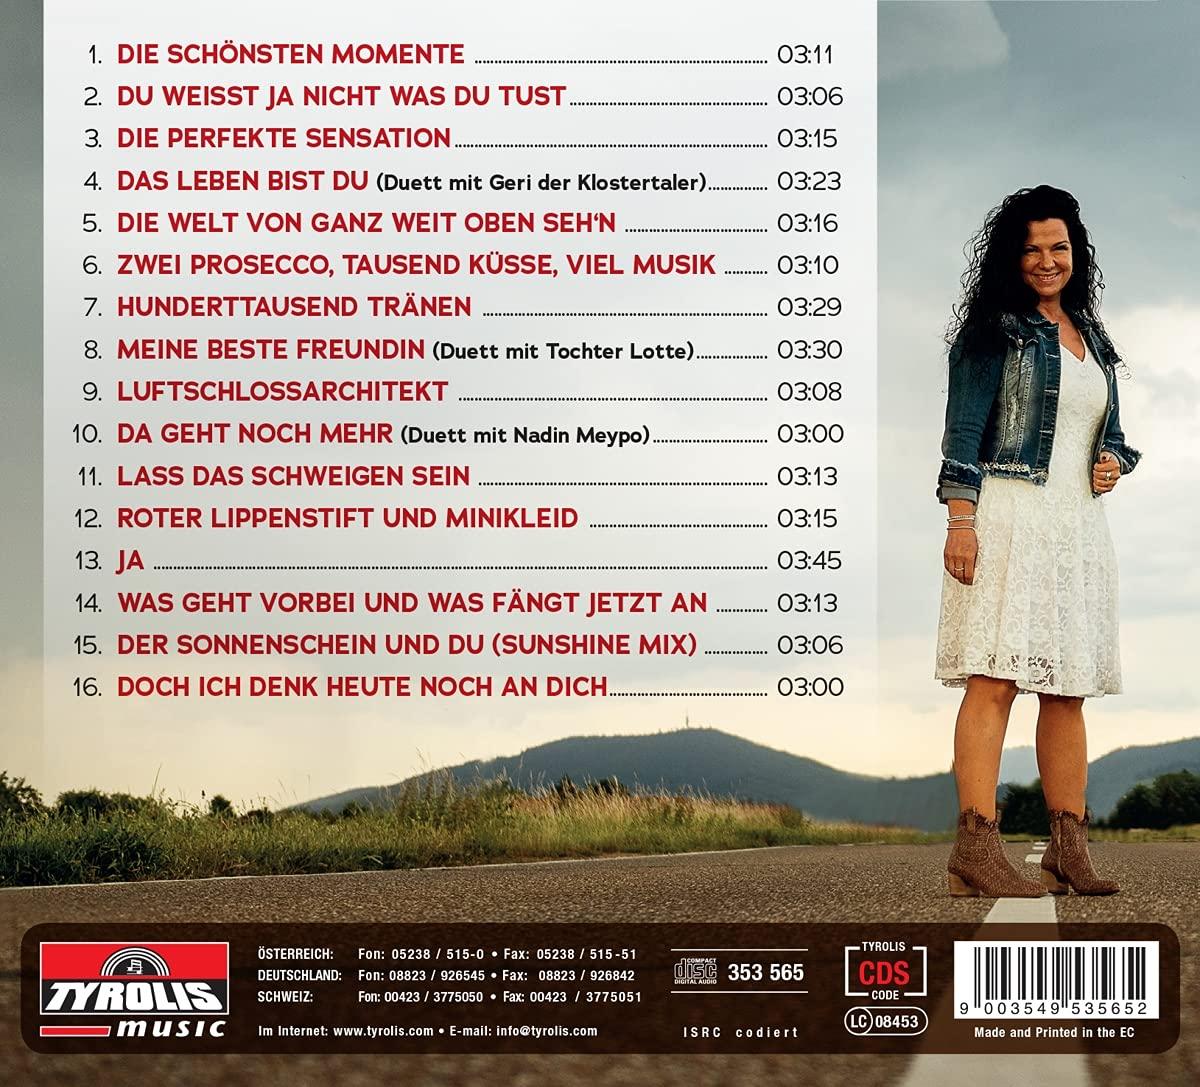 Daniela Martinez - Die perfekte Sensation (2021)